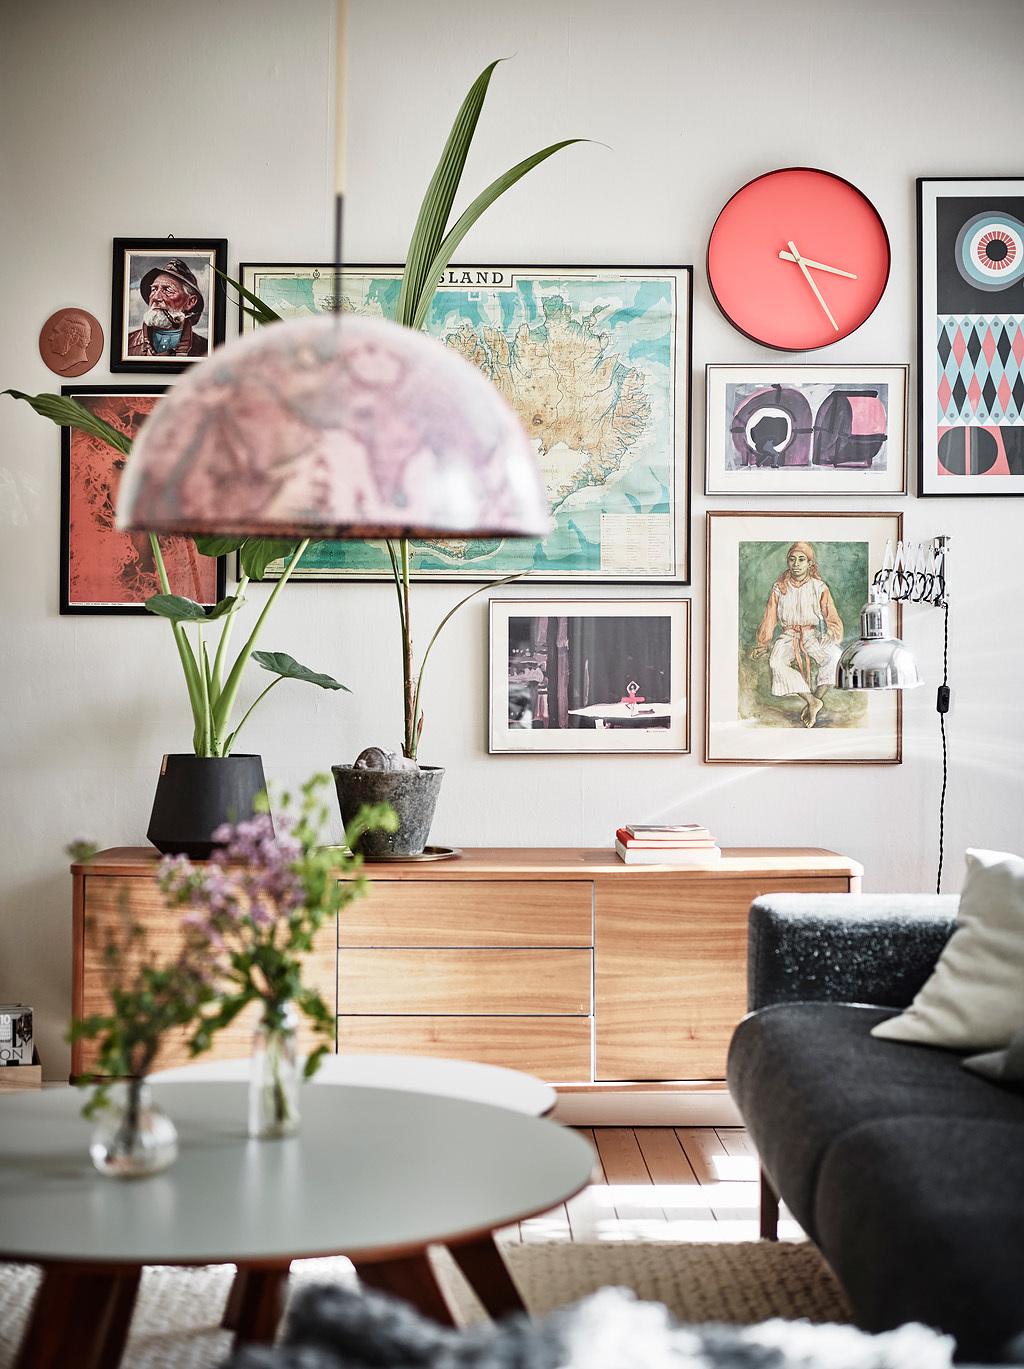 pastel color, interior design, scandinavian interior, wal lart, plants, boho chic, couch, pastel colors, sieboard